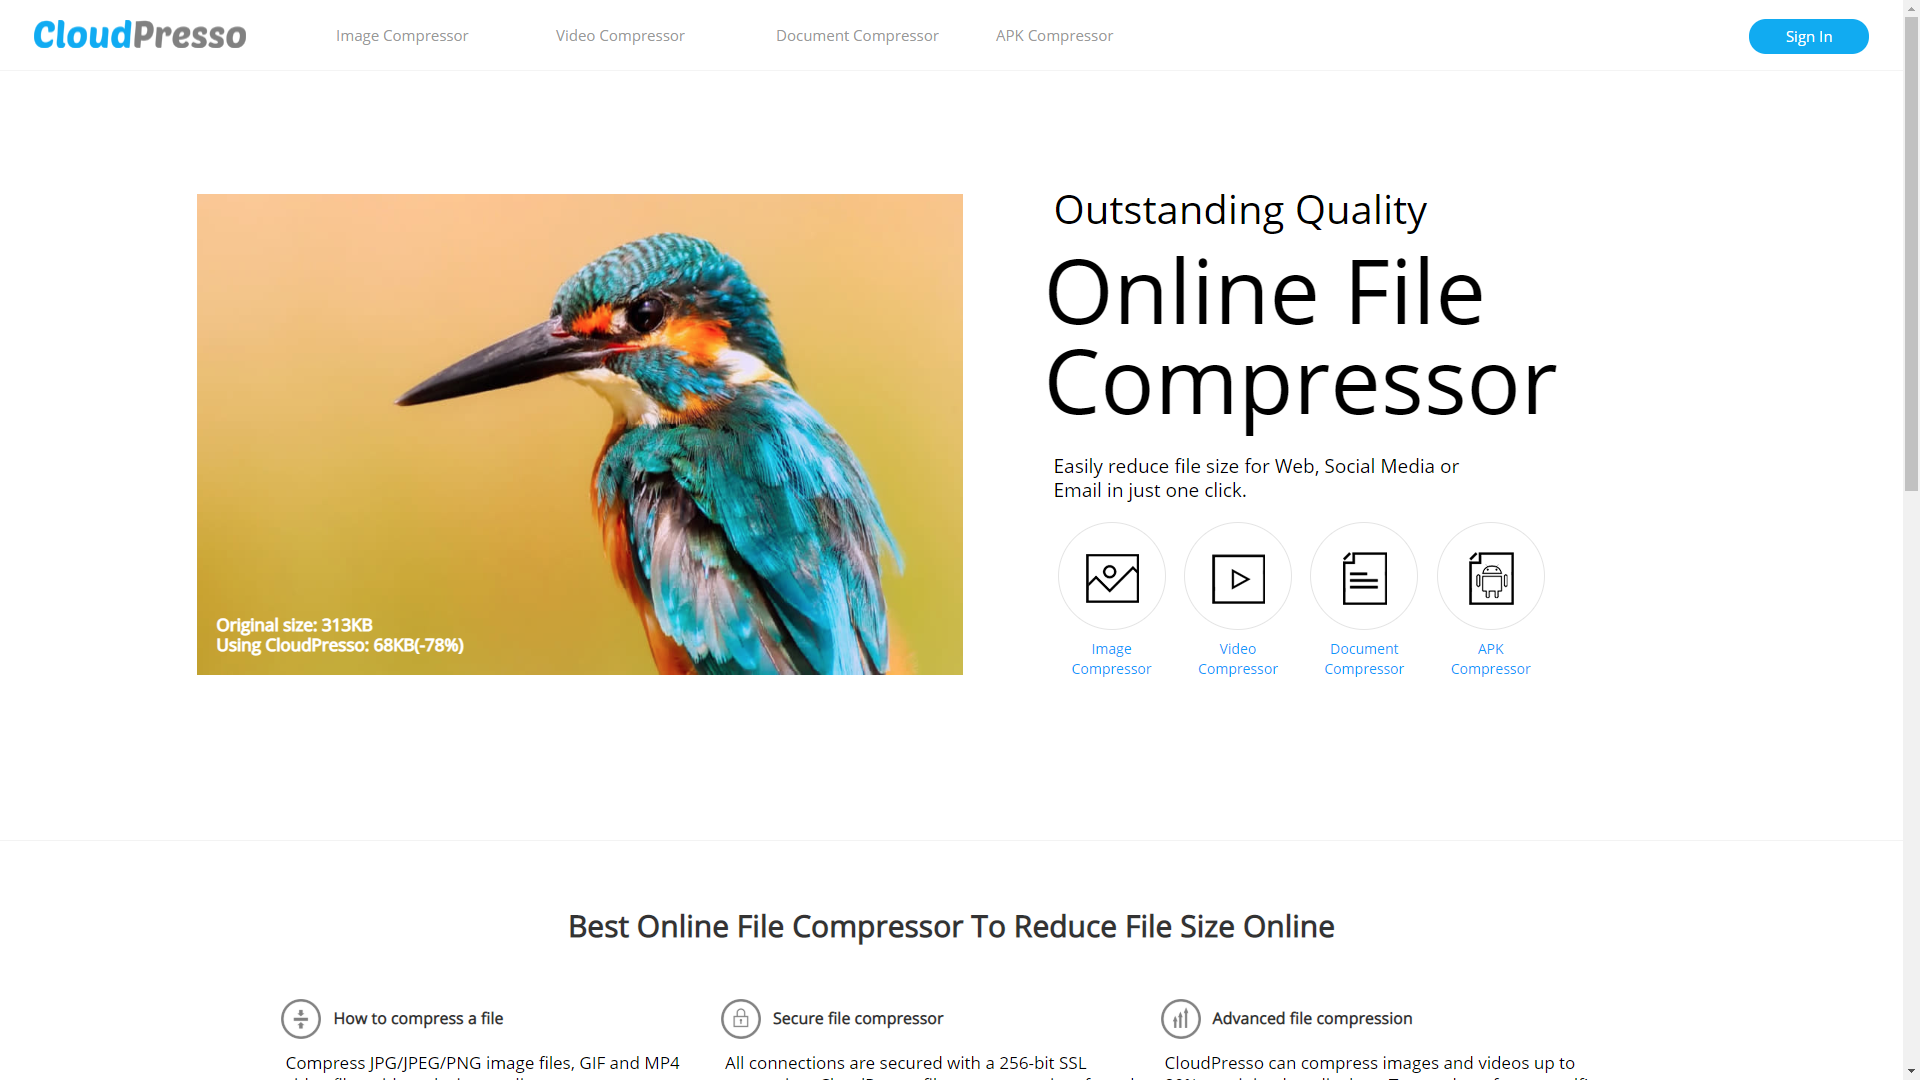 Cloudpresso File Compressor Online Amazon Co Uk Appstore For Android